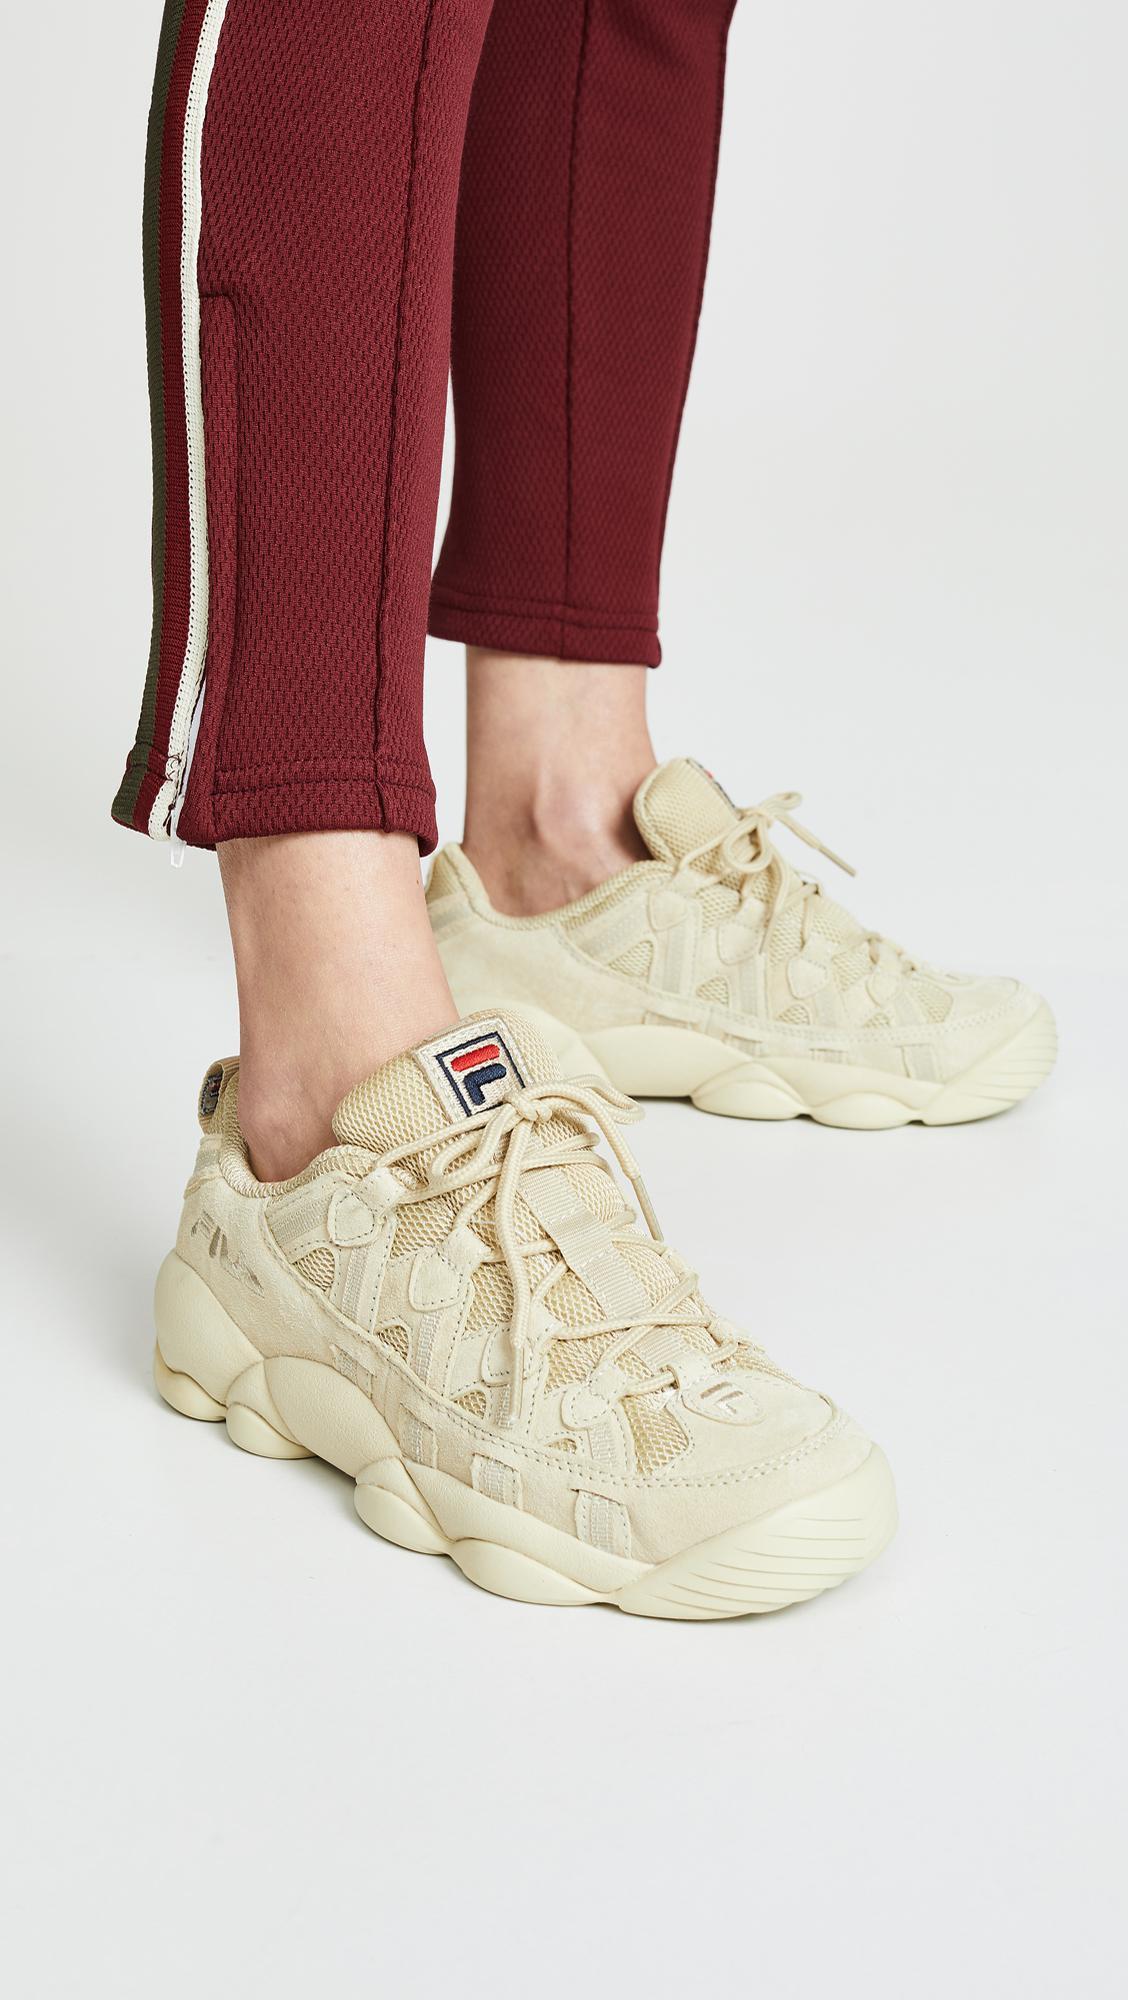 Fila Spaghetti Low Sneakers - Lyst